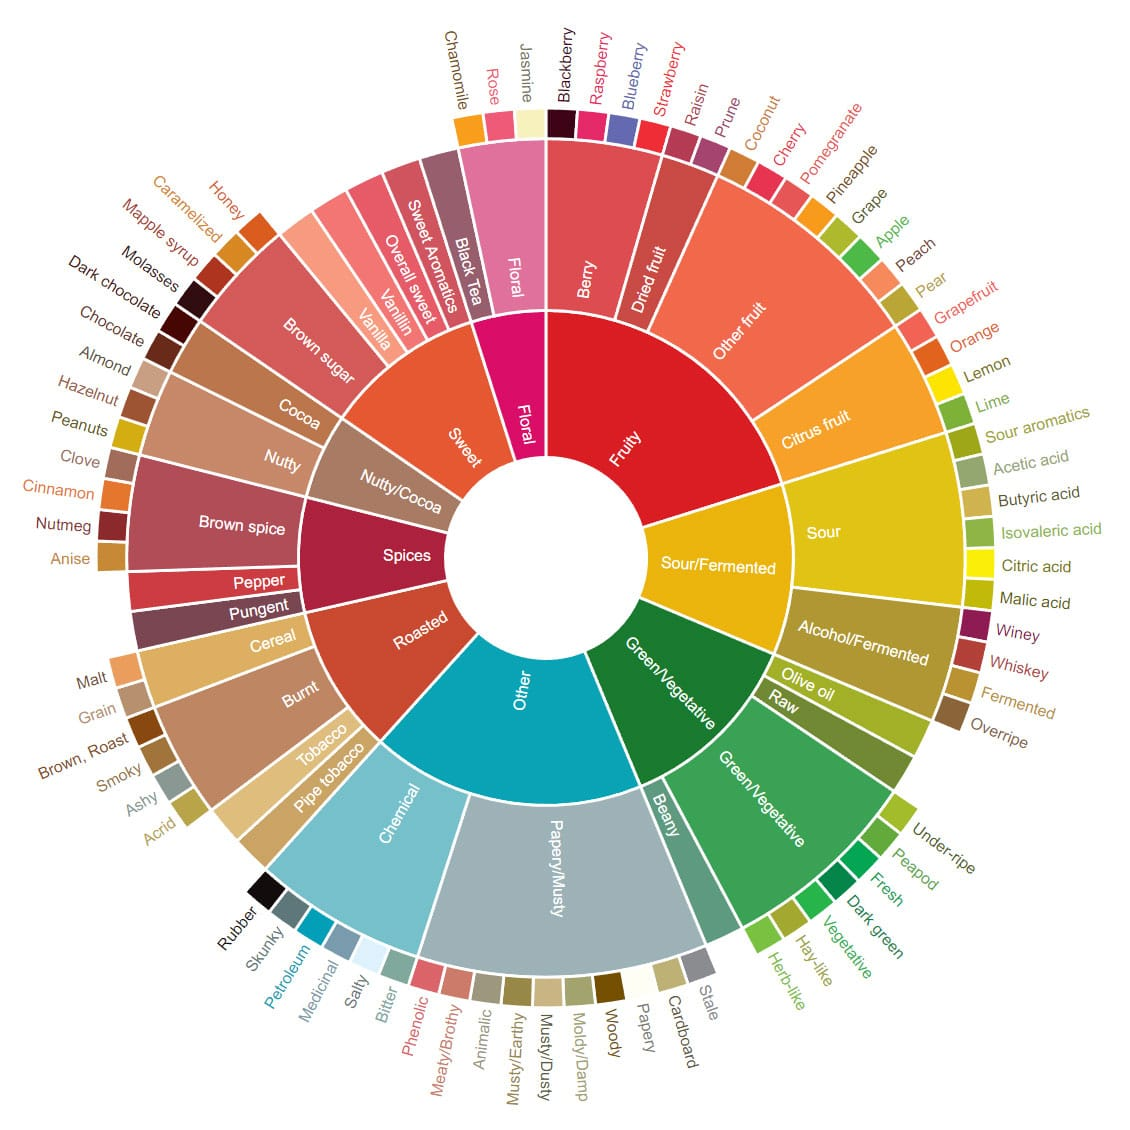 Coffee Taster's Flavor Wheel